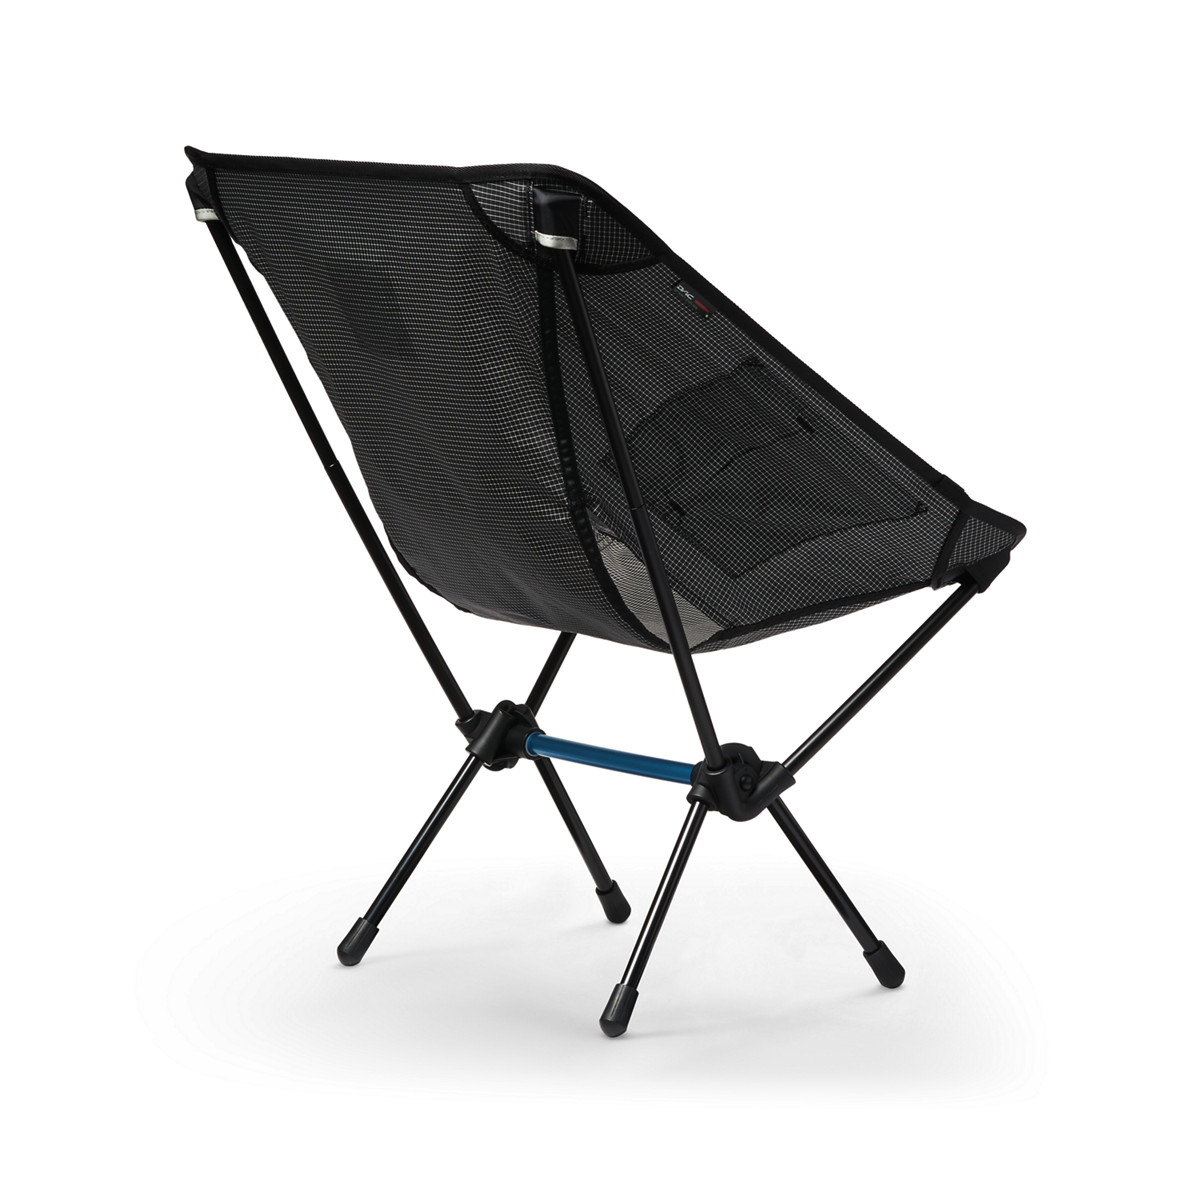 19SS Danner x Helinox Chair